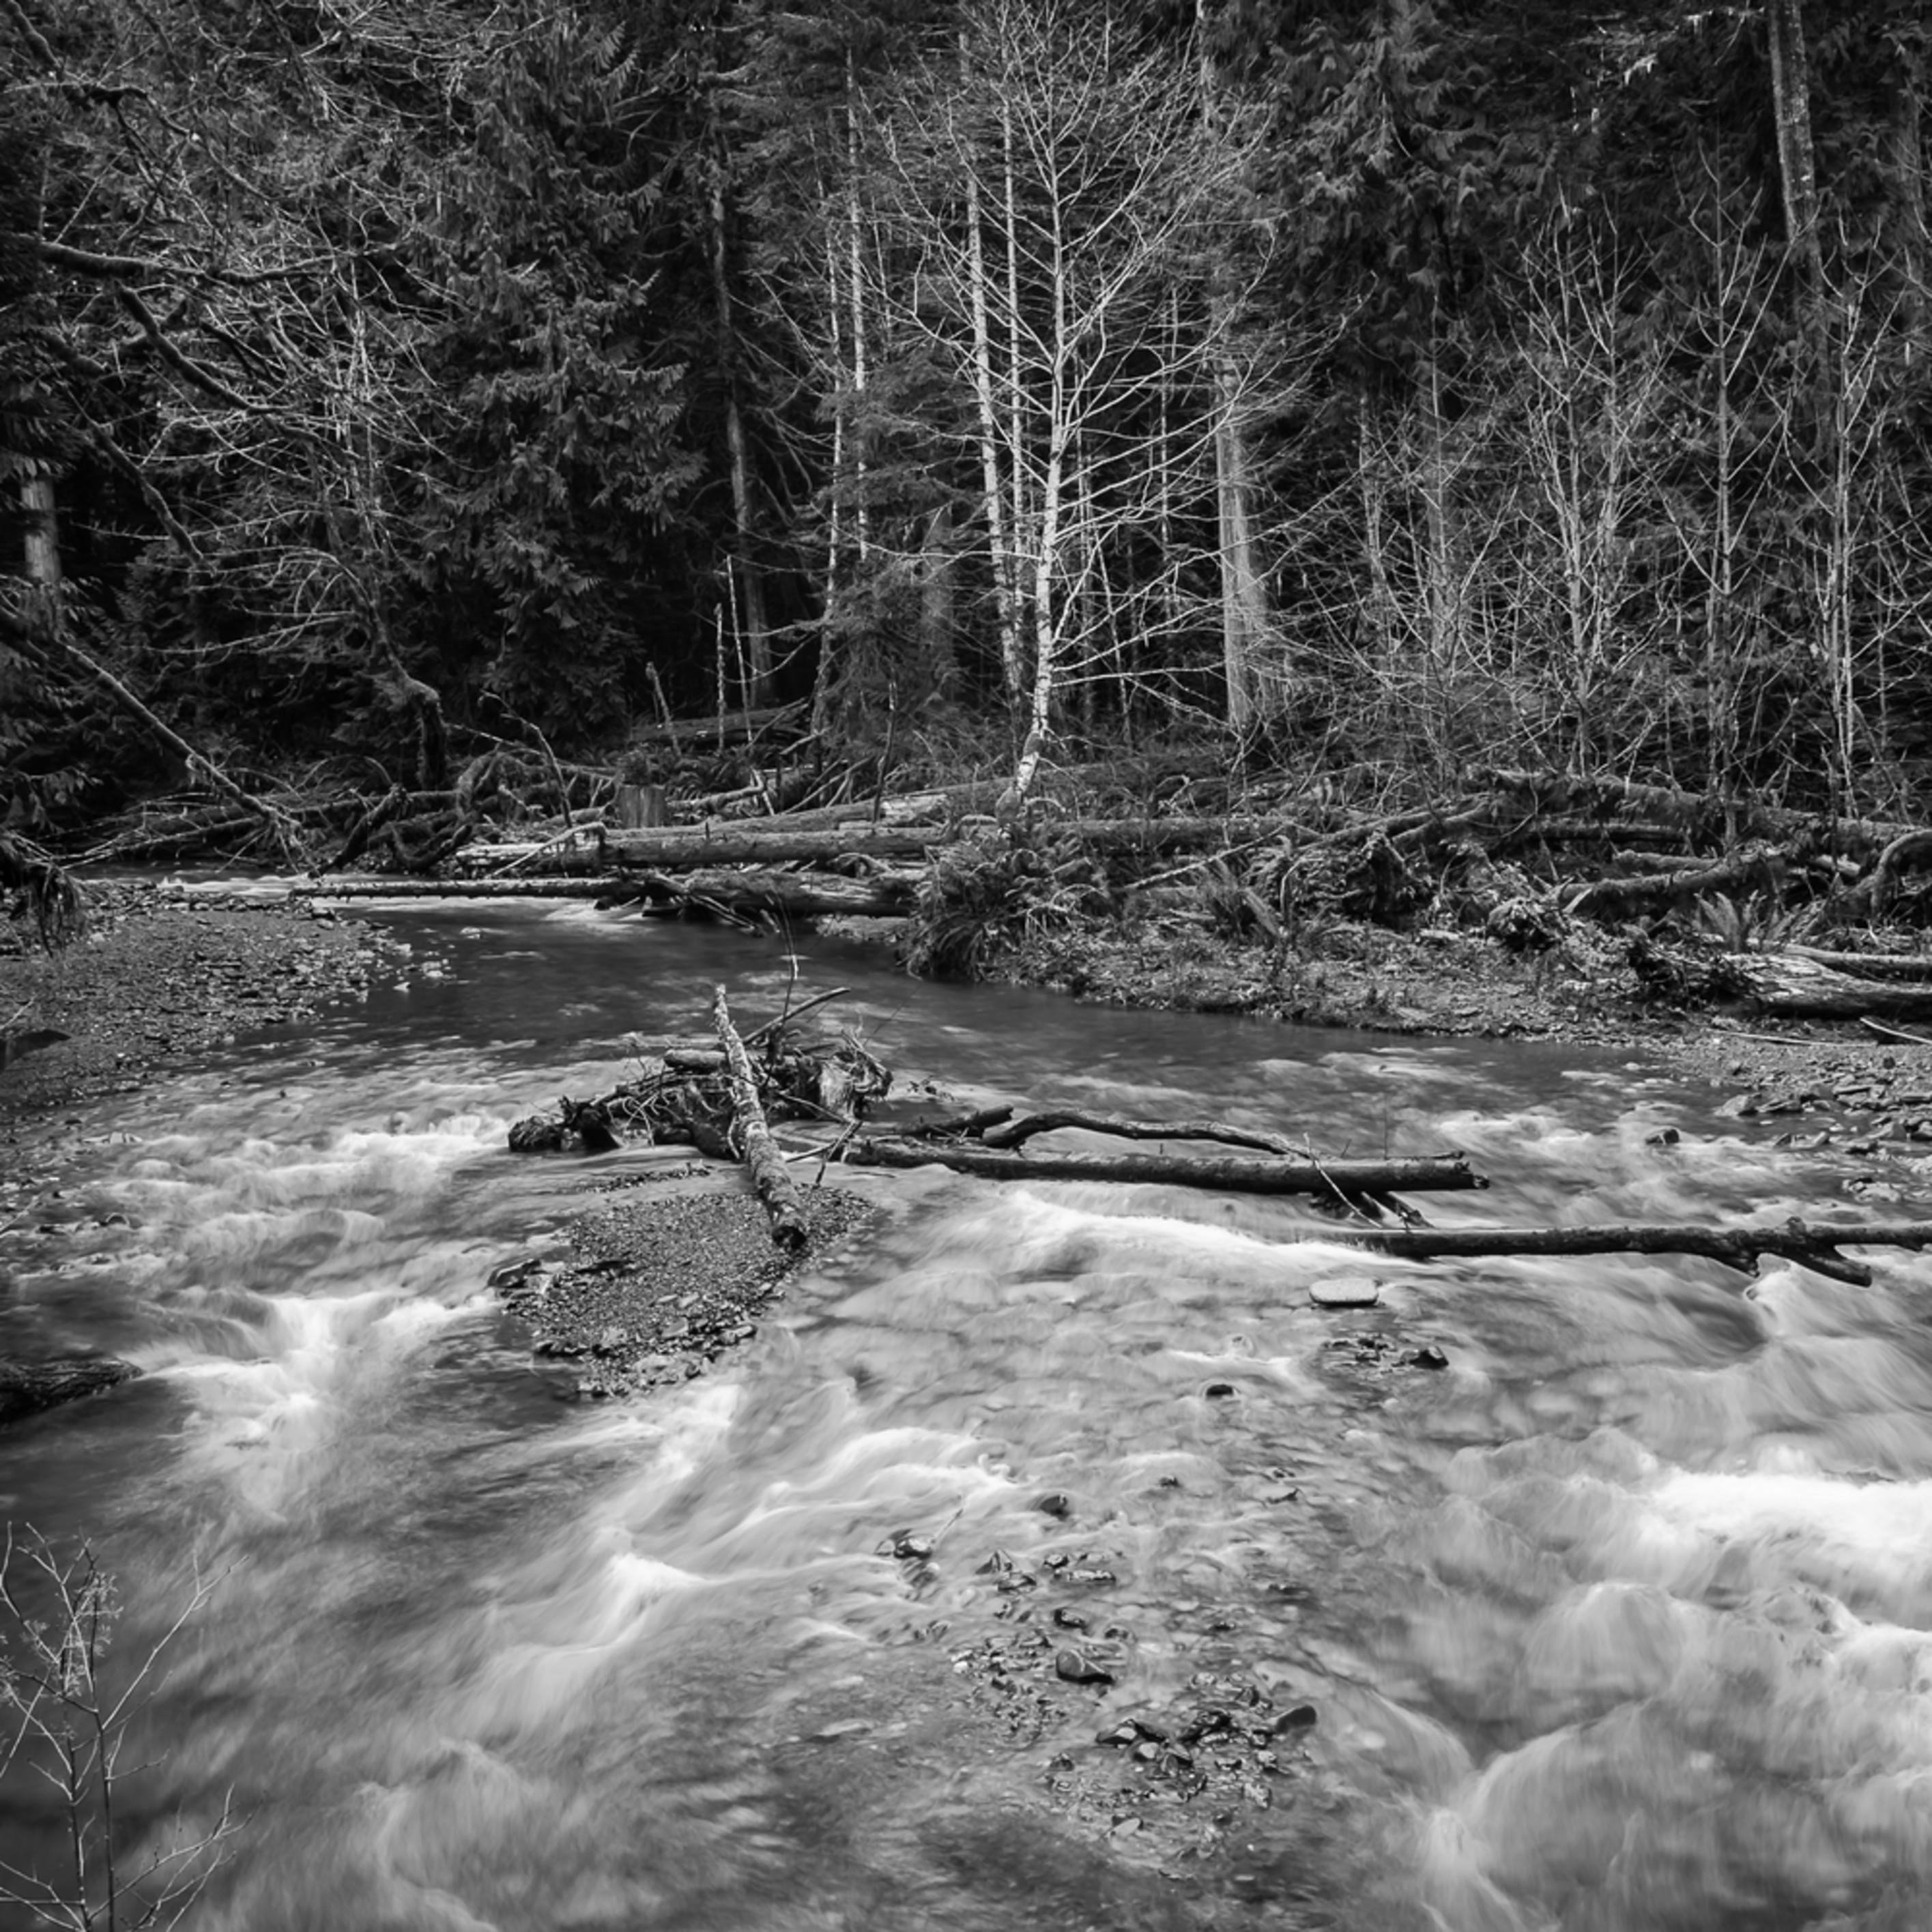 Barnes creek olympic national park washington 2016 lwp5iz